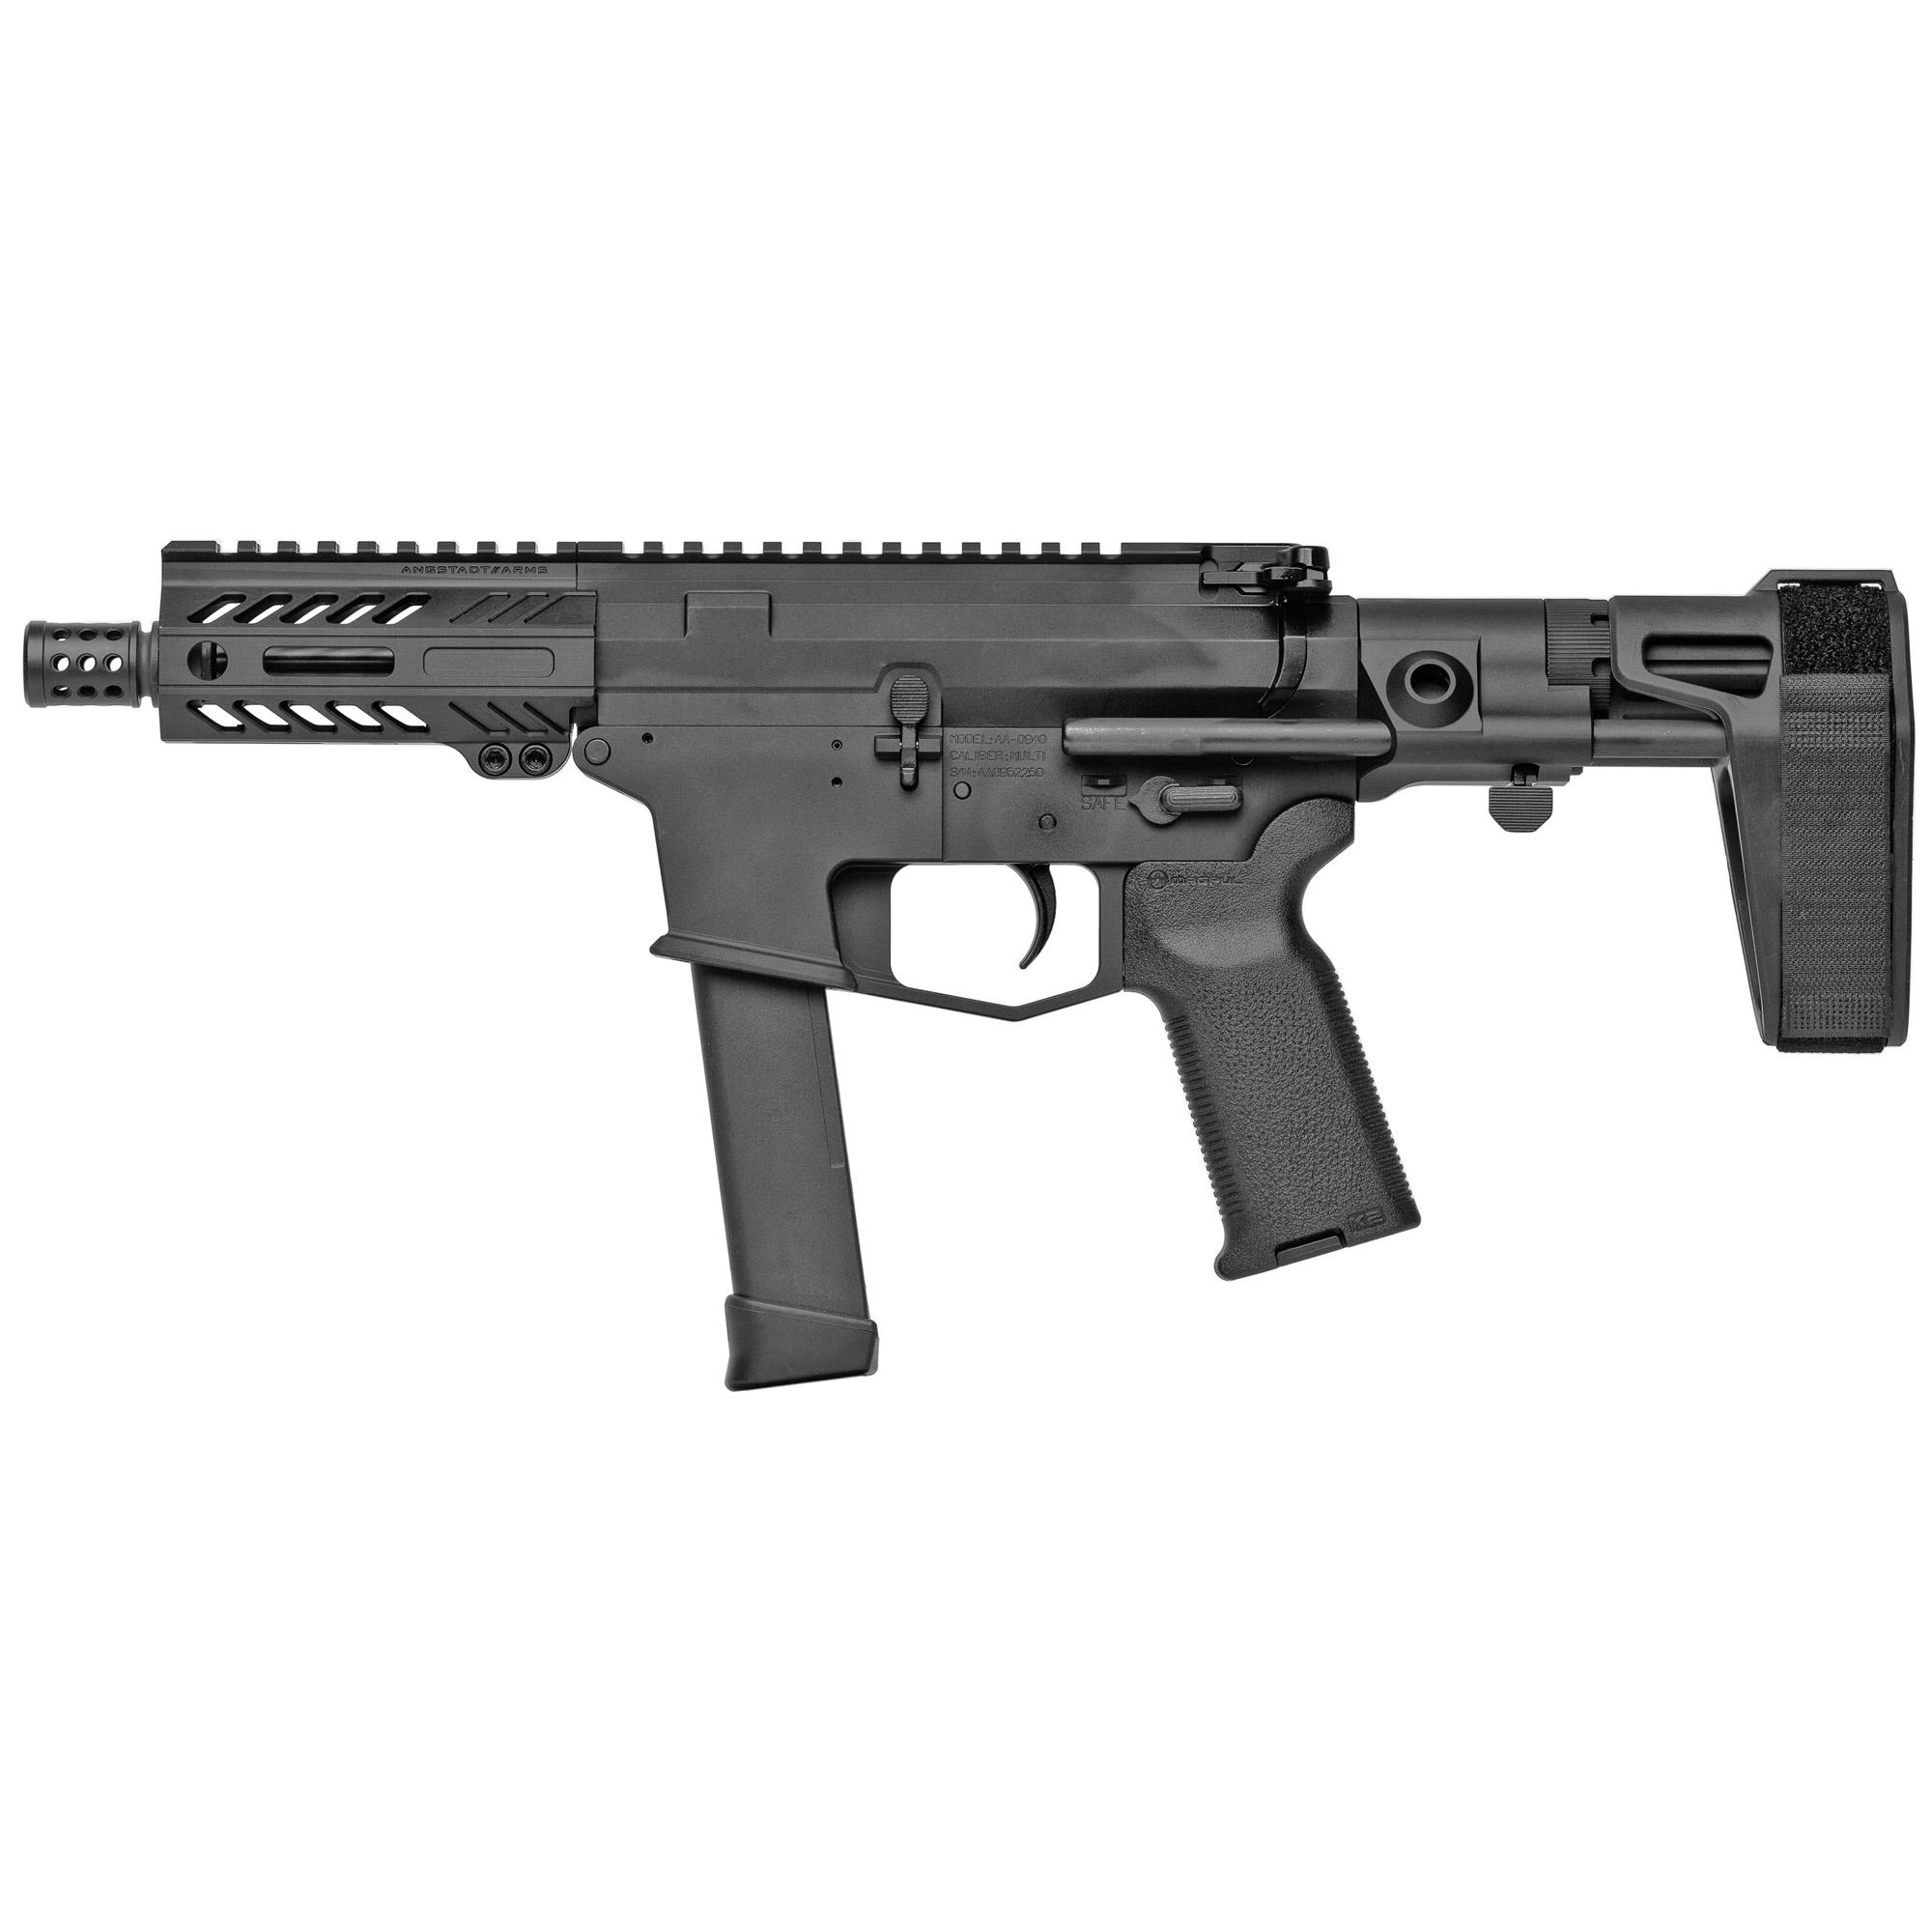 Angstadt Udp-9 Pstl 9mm 4.5 Psb 17r